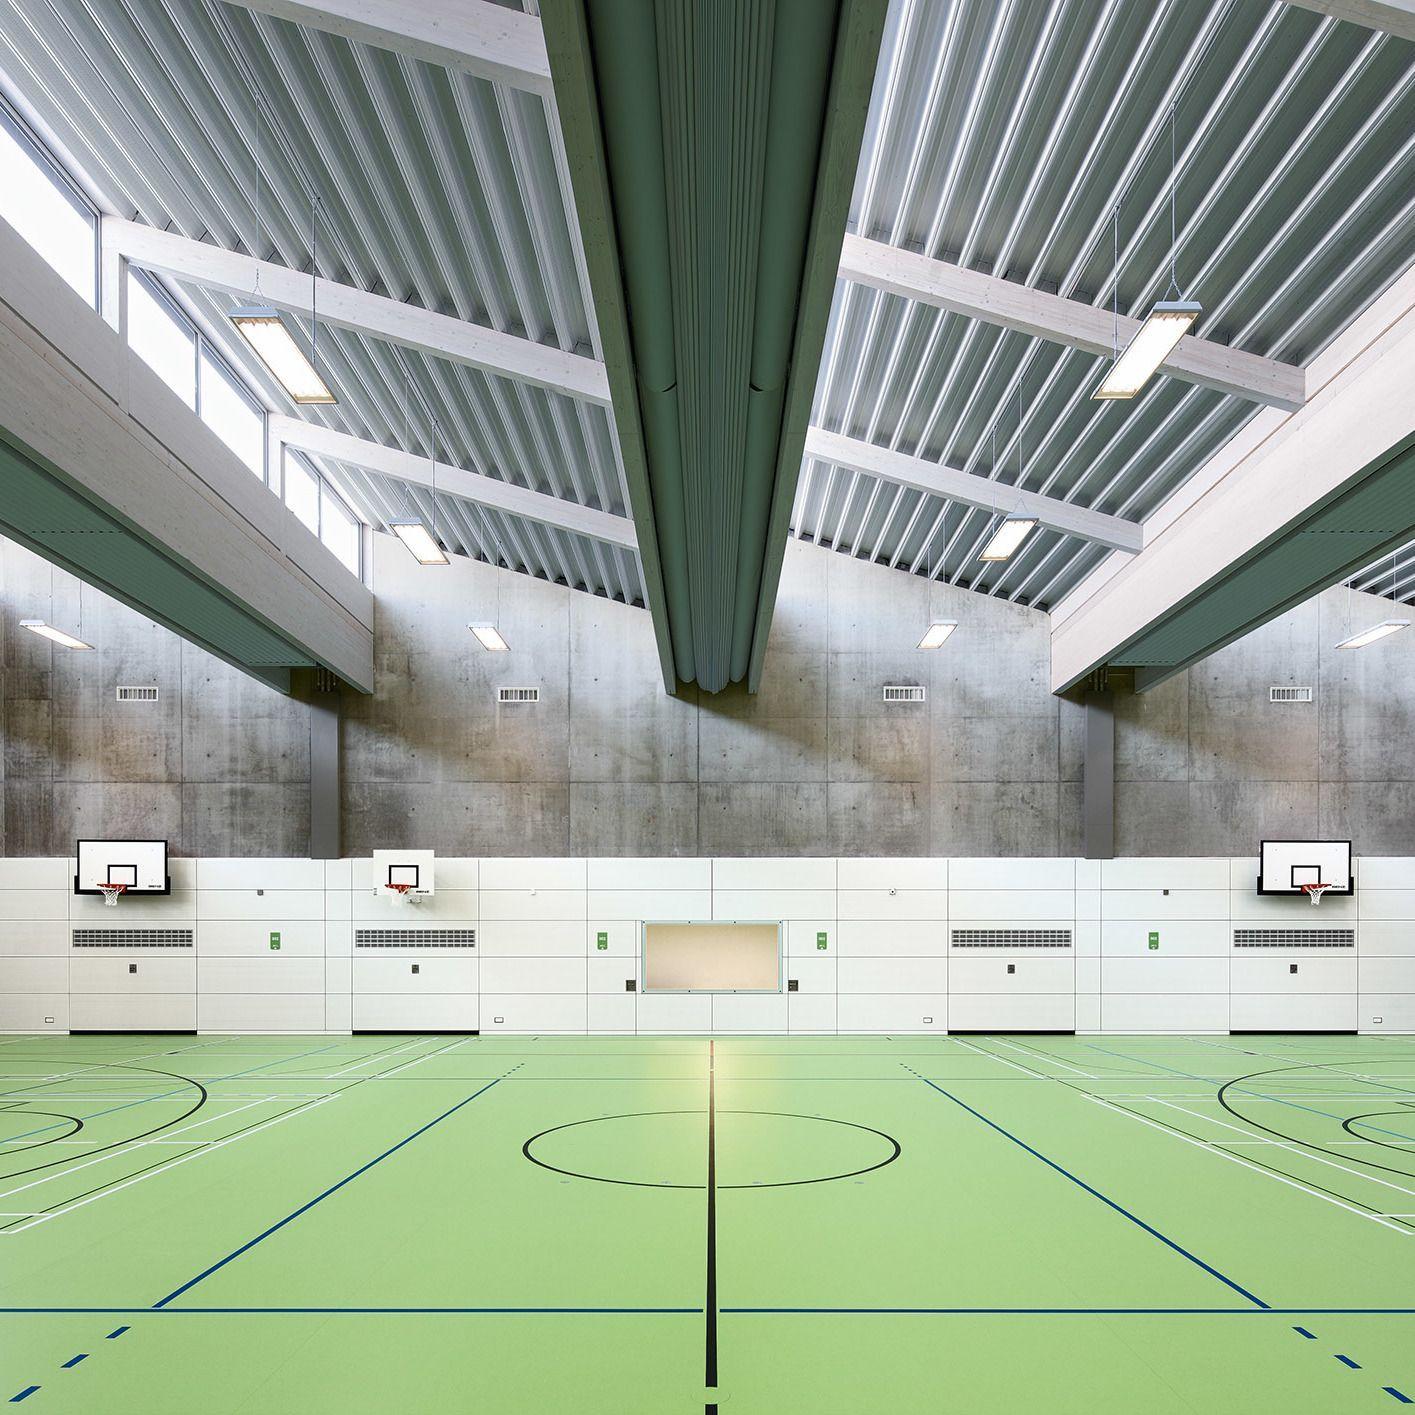 Neubau Zweifeld Sporthalle A D Max Planck Schule Russelsheim Sporthalle Neubau Halle